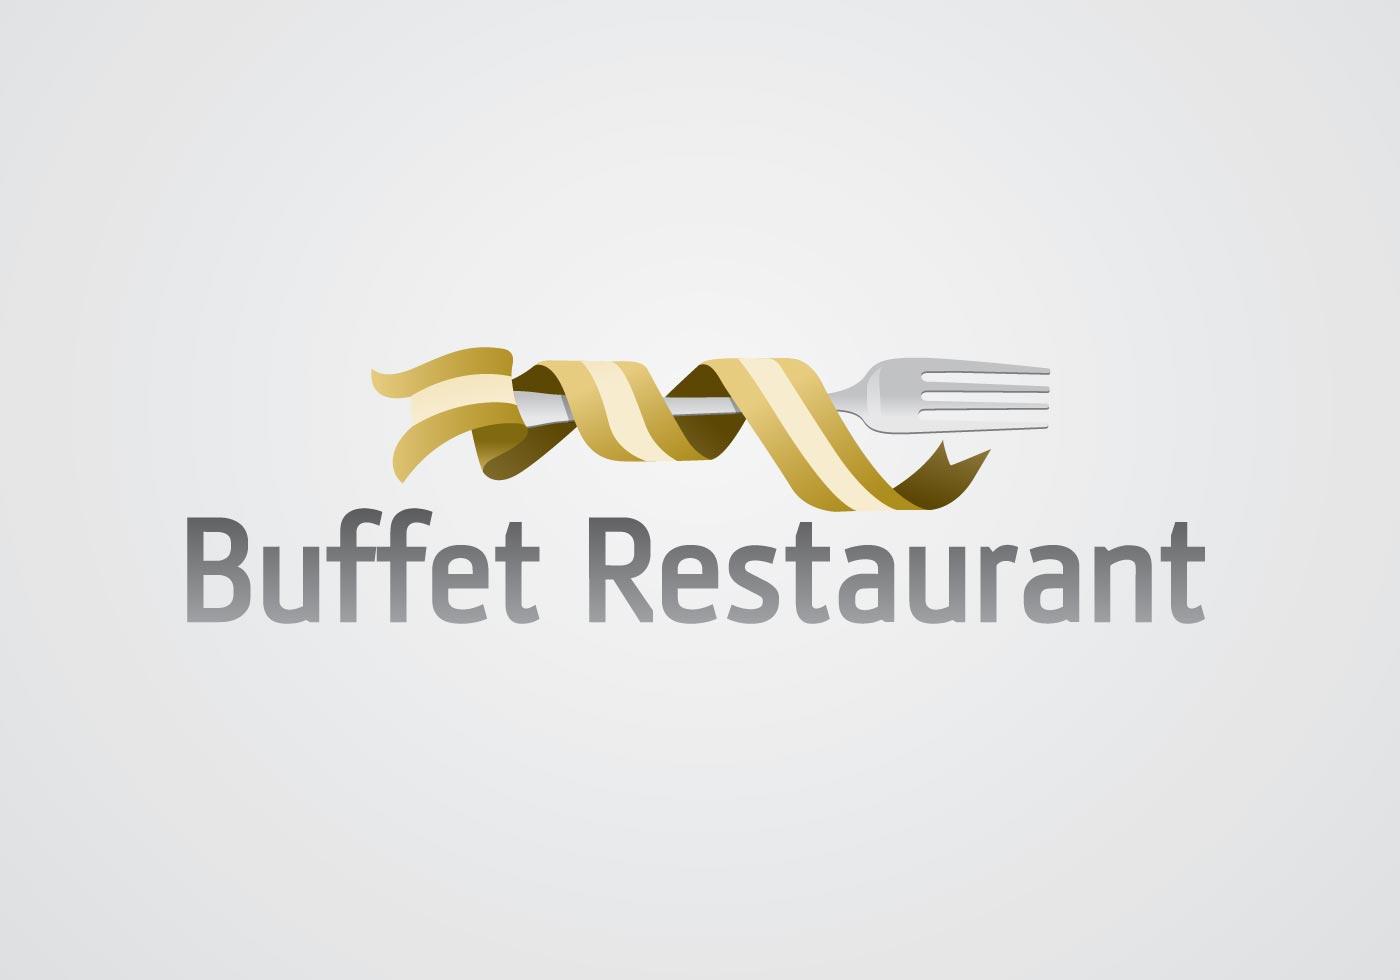 Buffet Restaurant Download Free Vector Art Stock